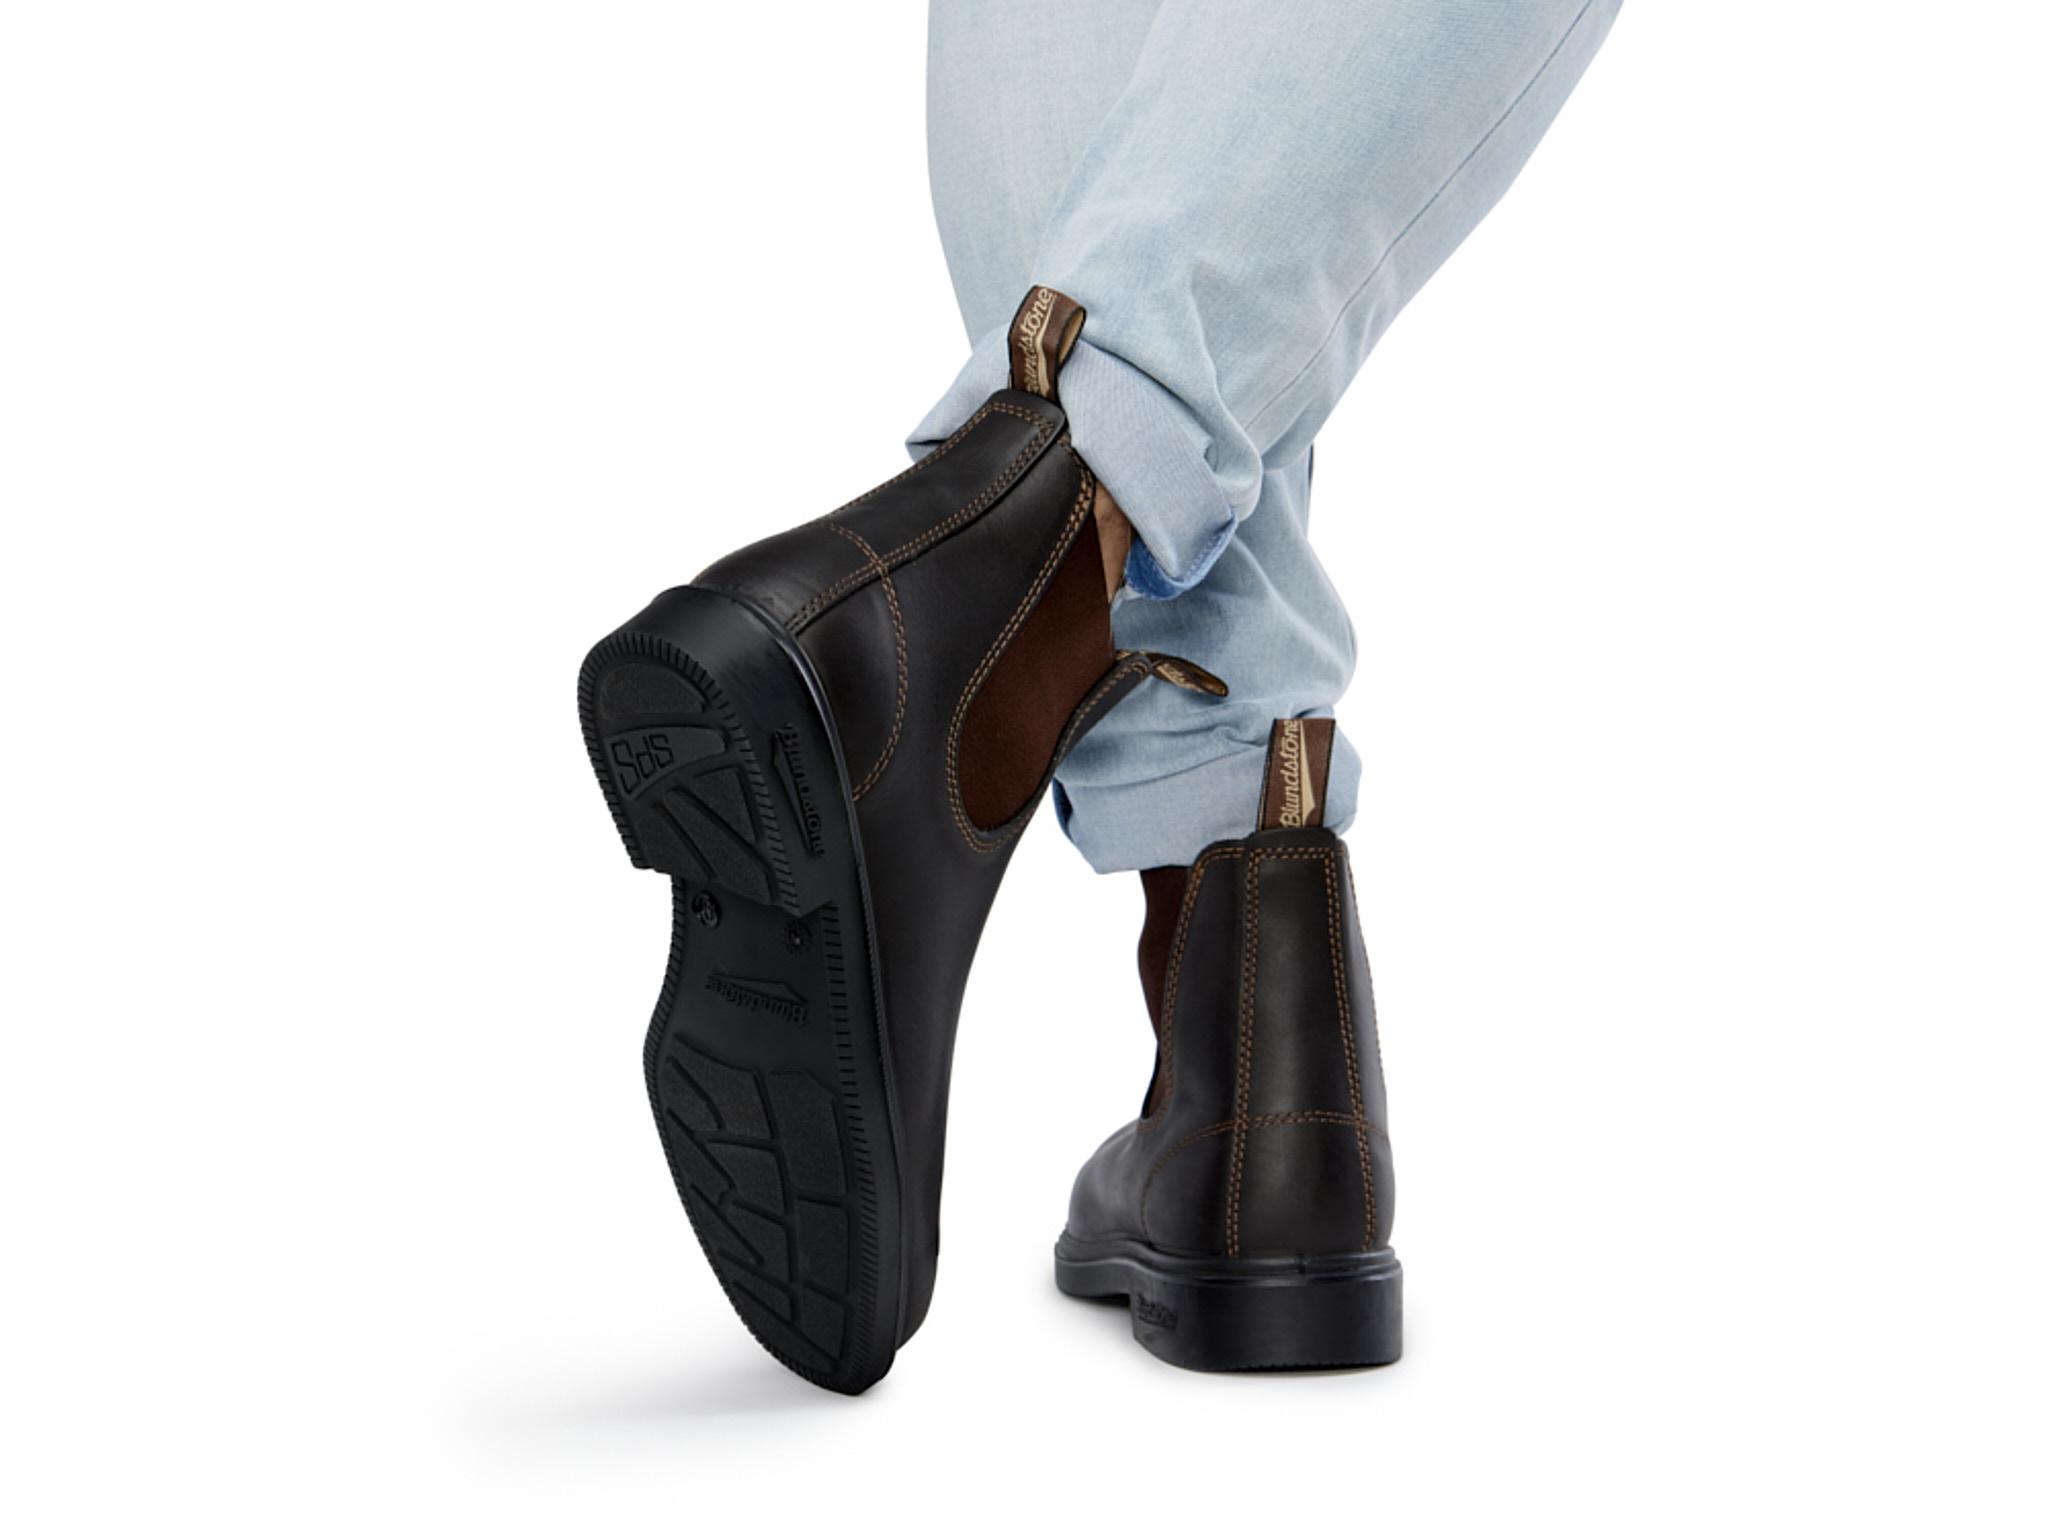 Boots & Stories Campagne Webshop fotografie